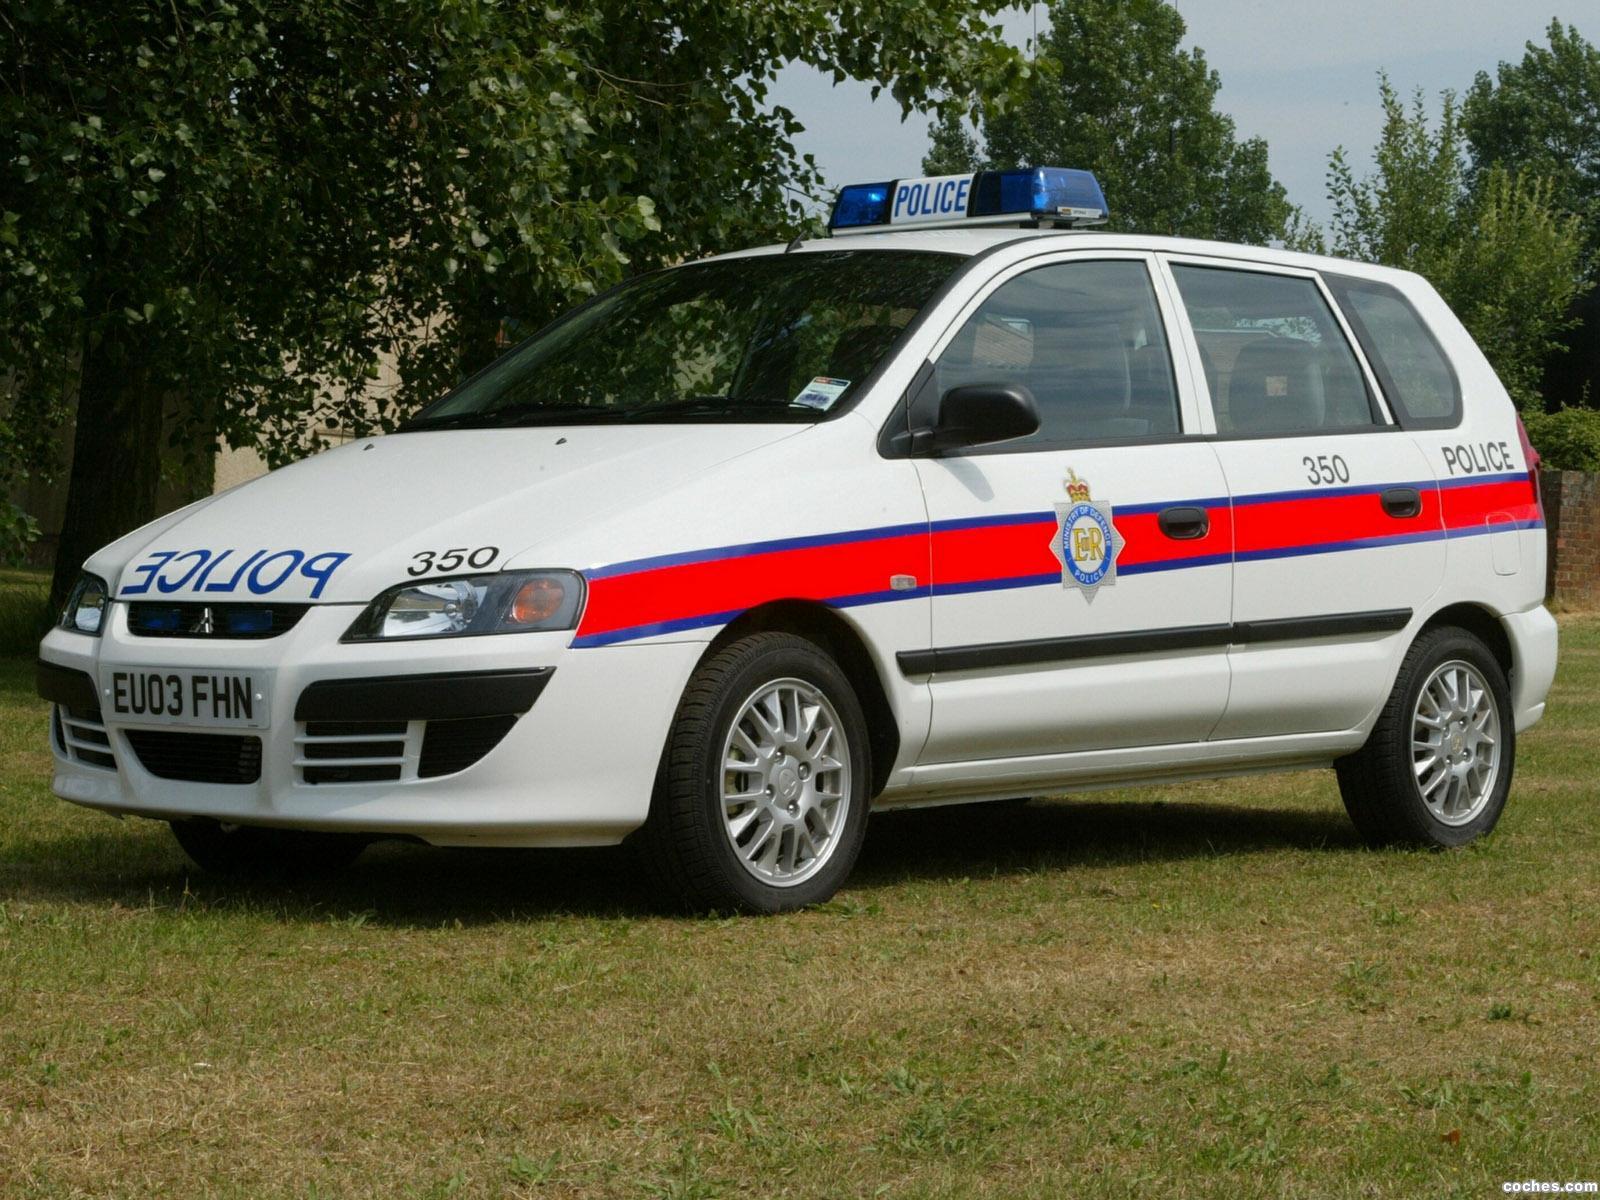 mitsubishi_space-star-police-car-2002-05_r1